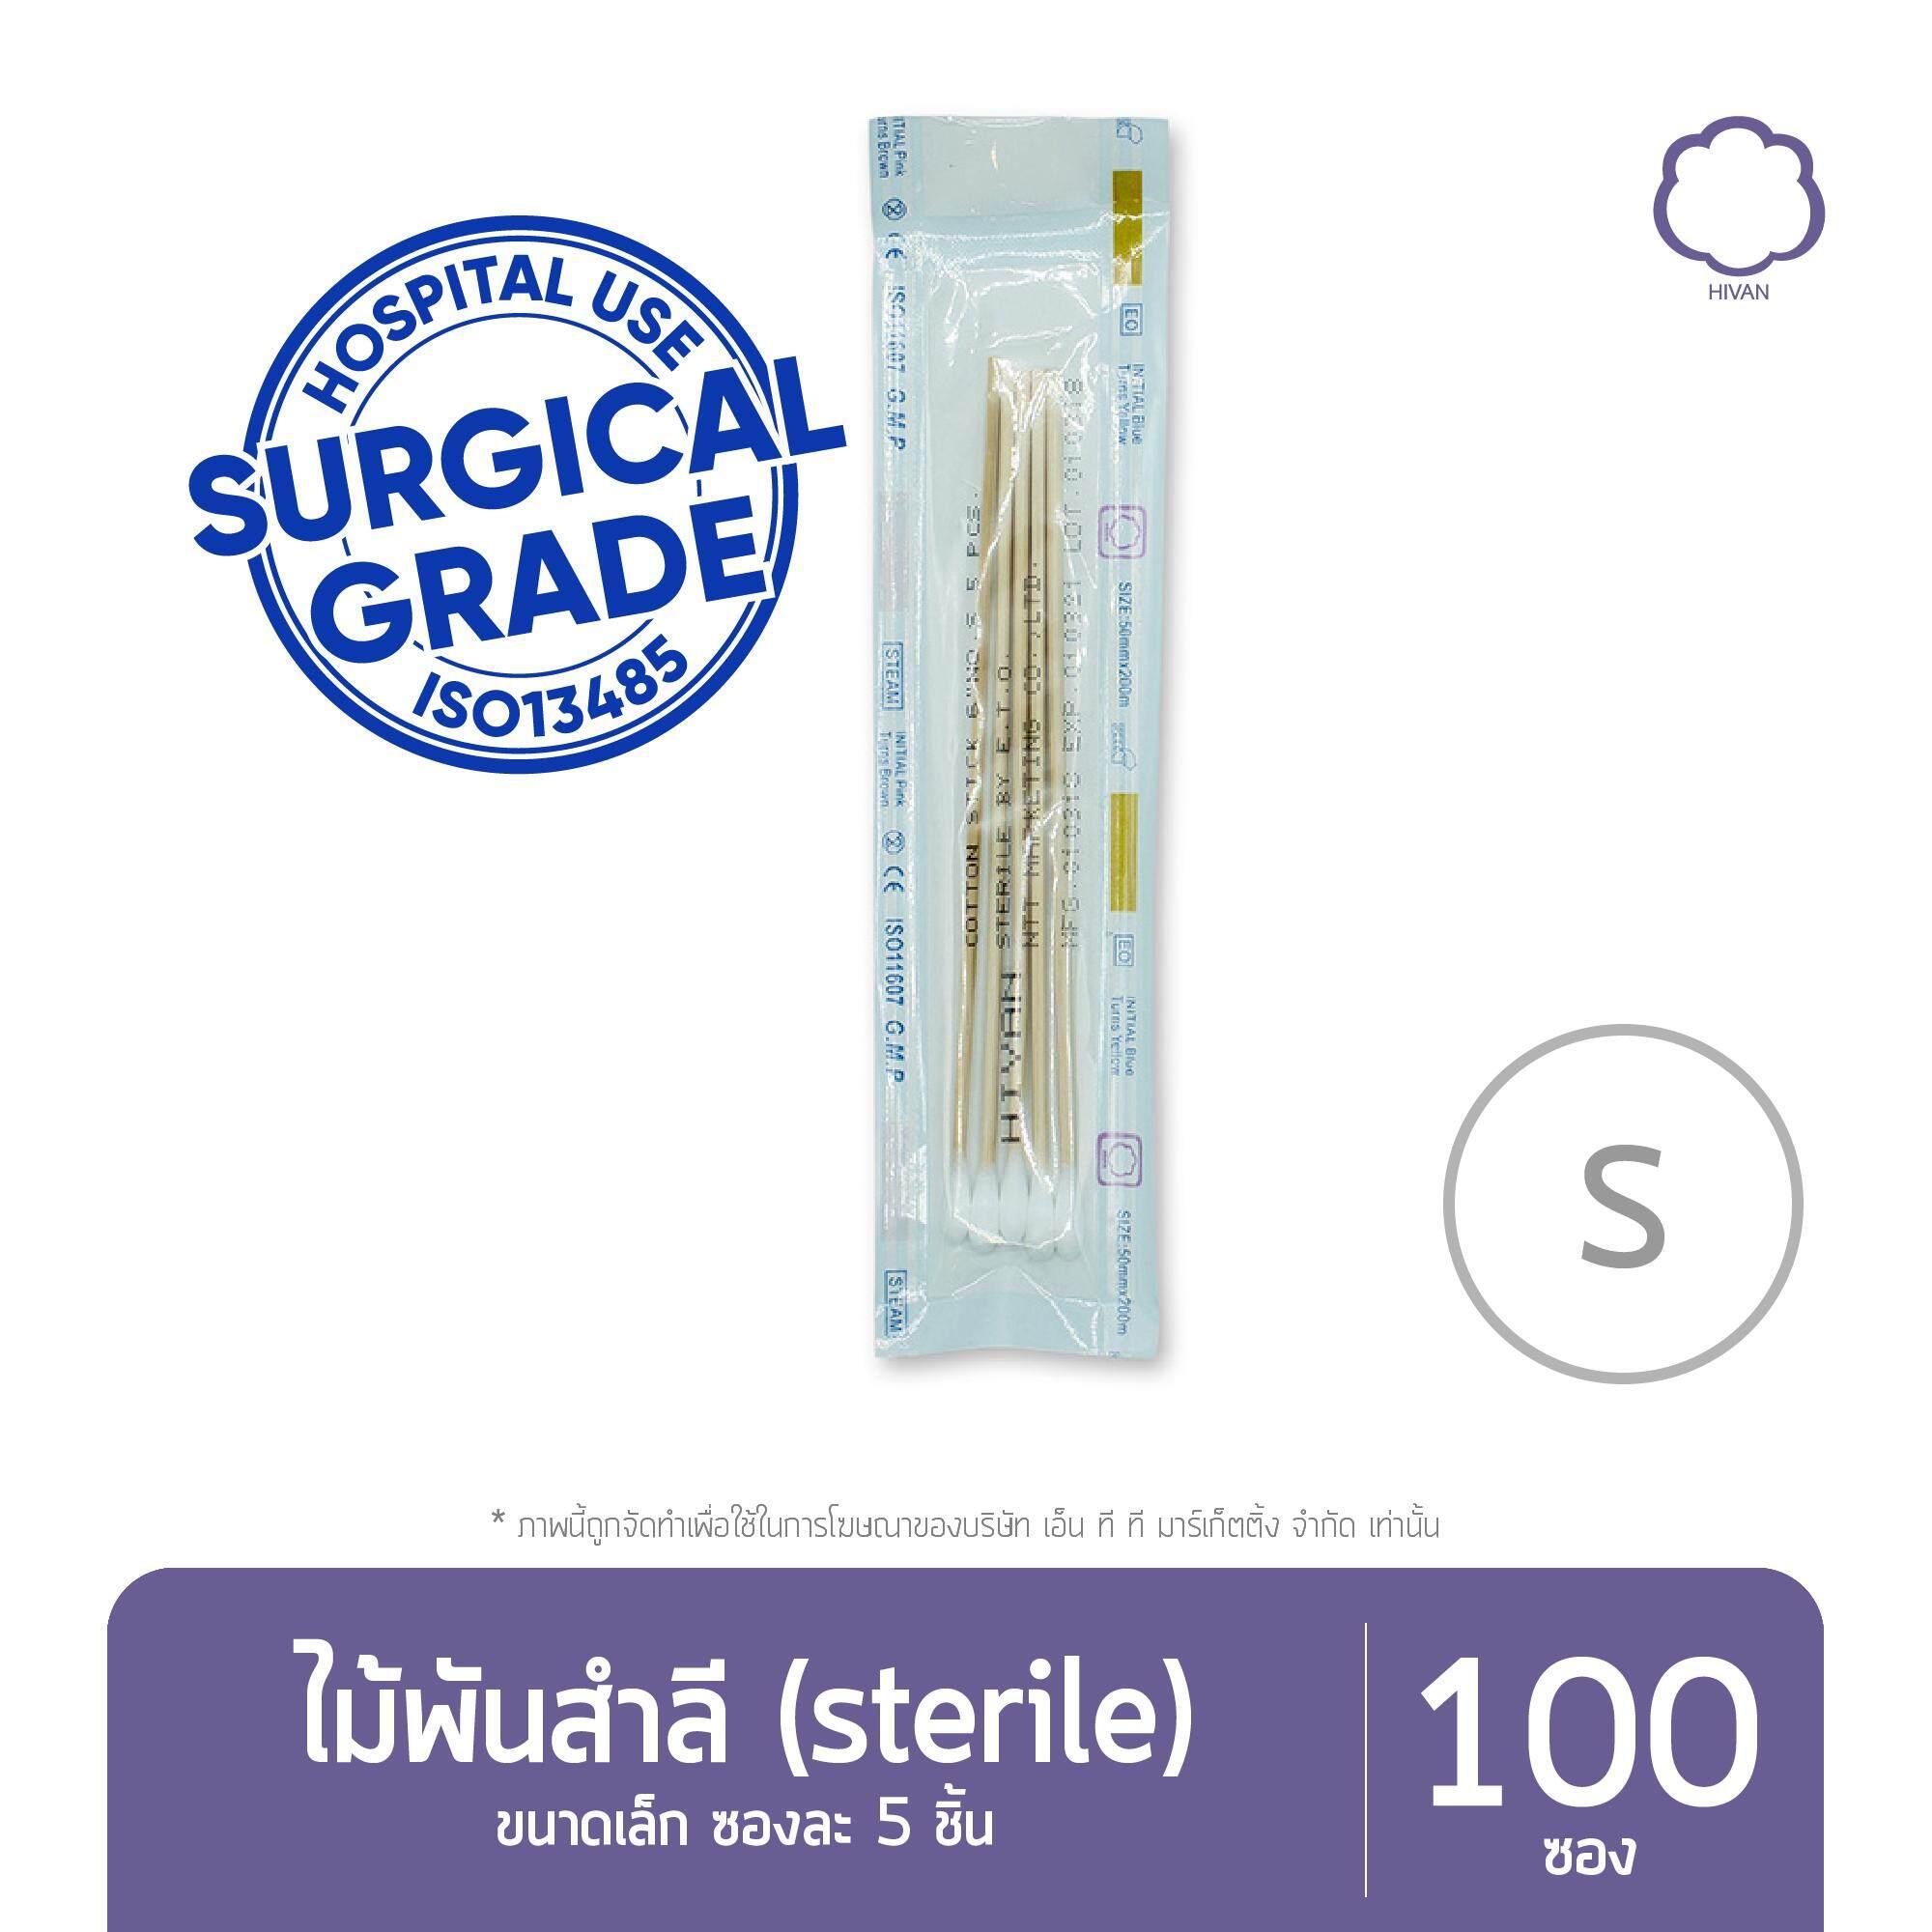 Hivan - ไม้พันสำลี ขนาดเล็ก (sterile) 5pcs X100 By Hivan Medical Supplies.